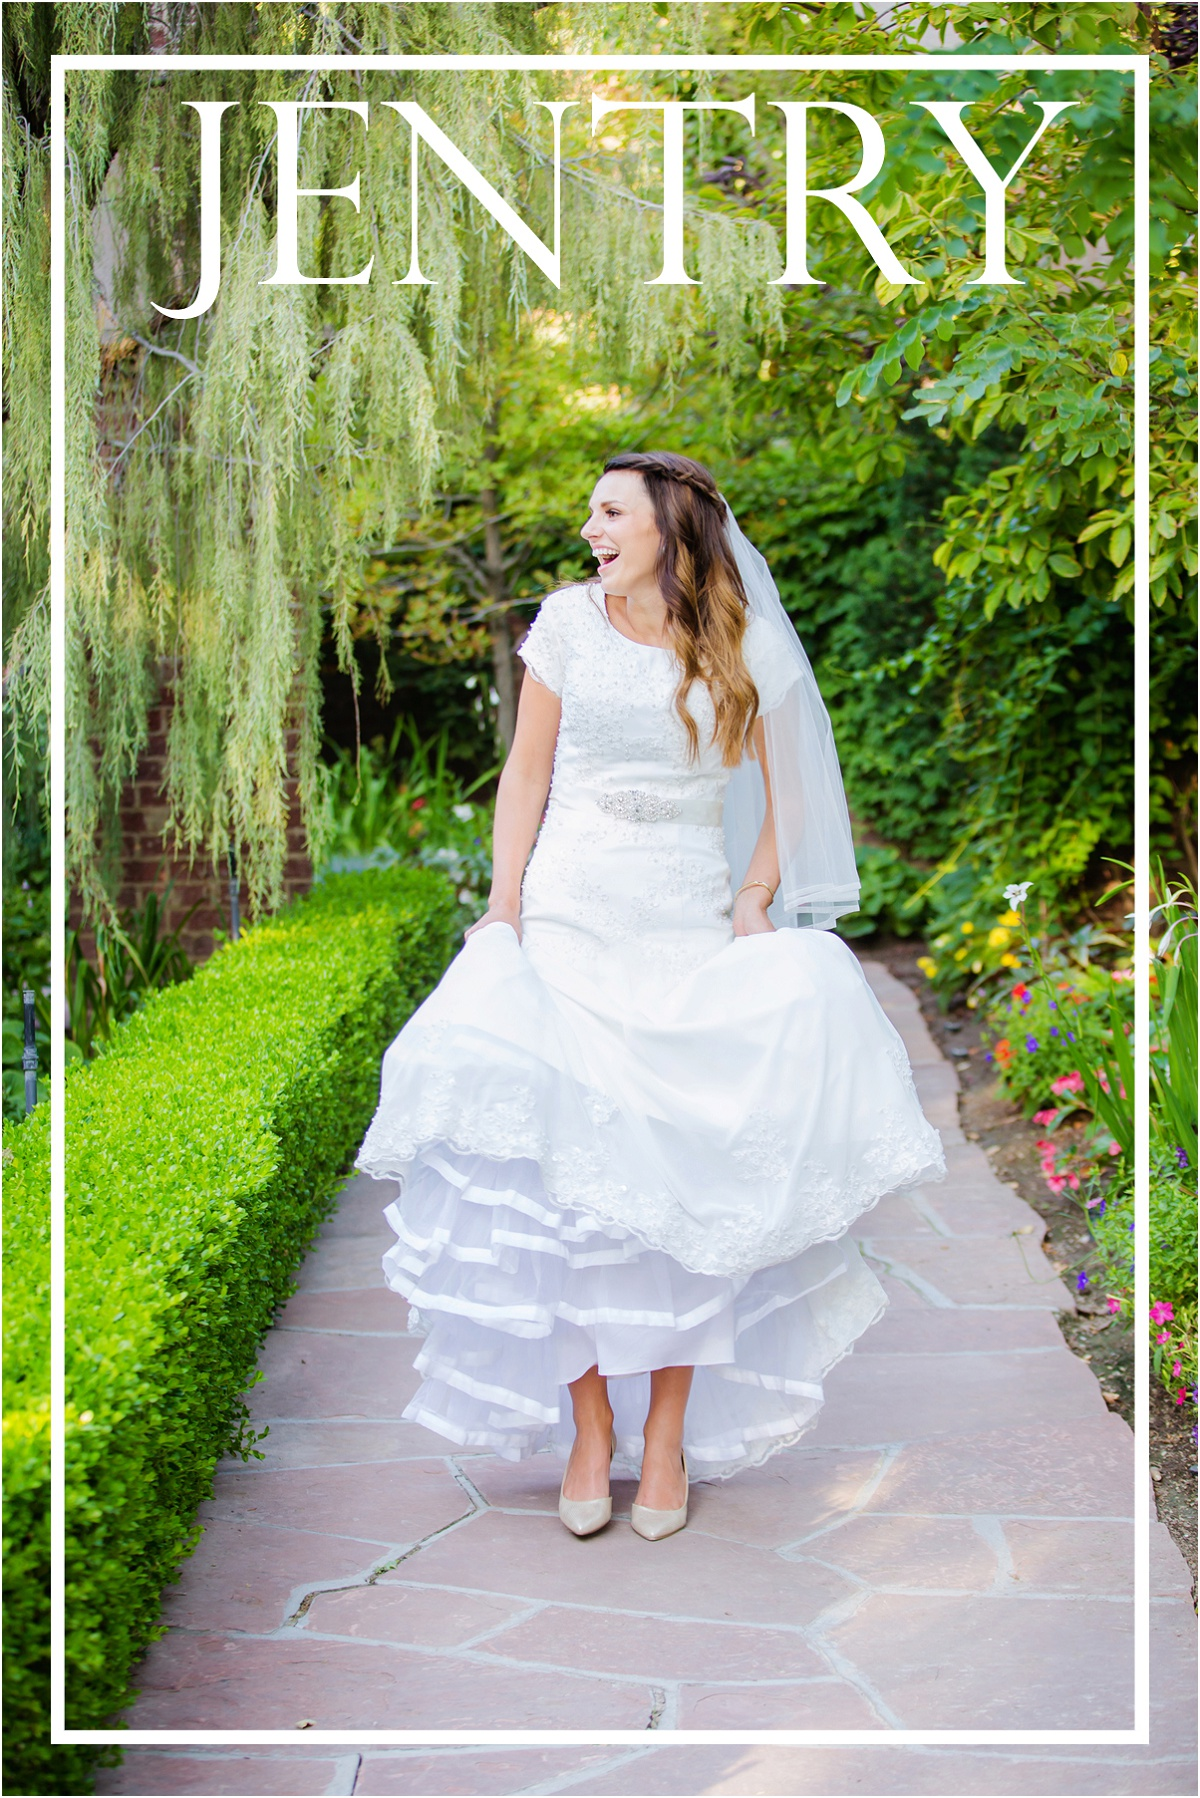 Terra Cooper Photography Weddings Brides 2015_5373.jpg